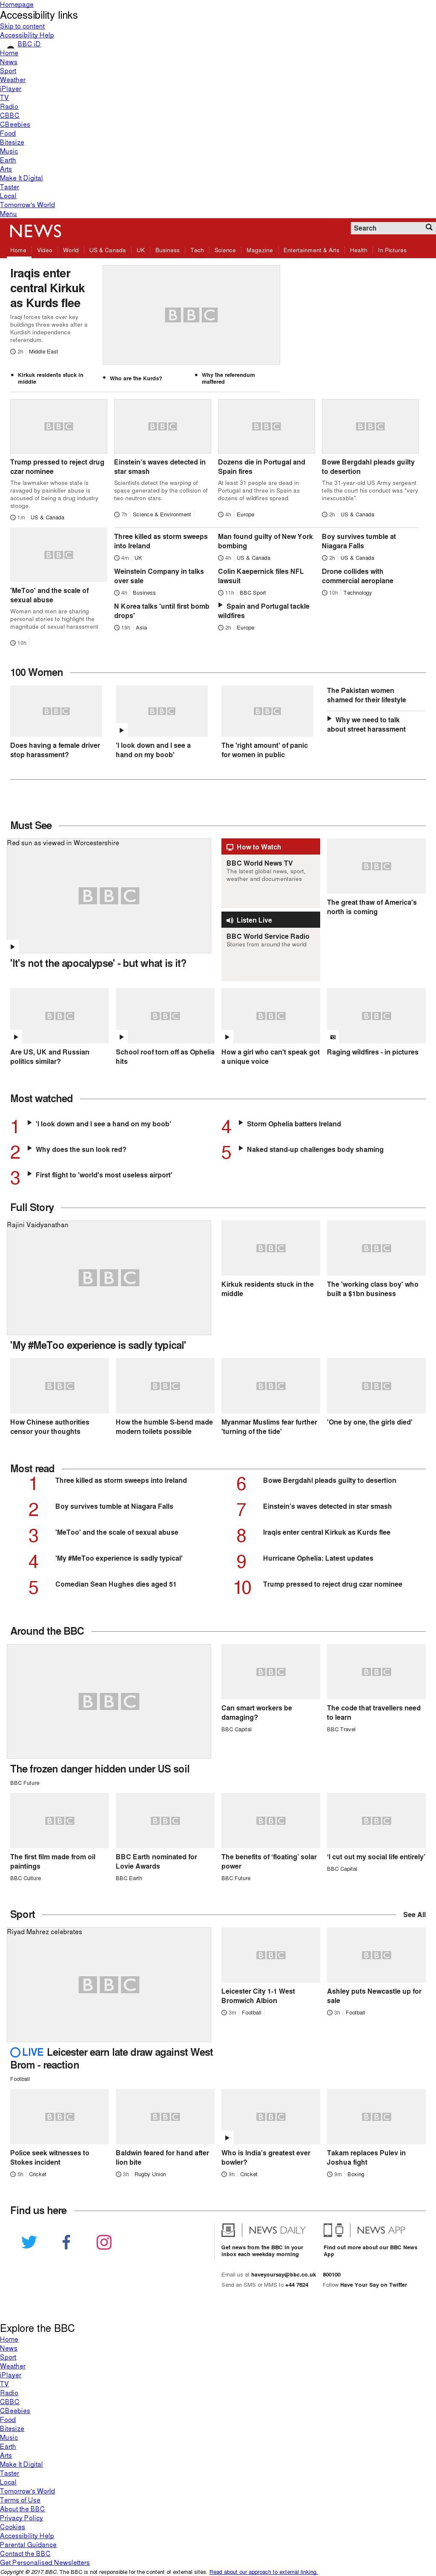 BBC at Monday Oct. 16, 2017, 9 p.m. UTC